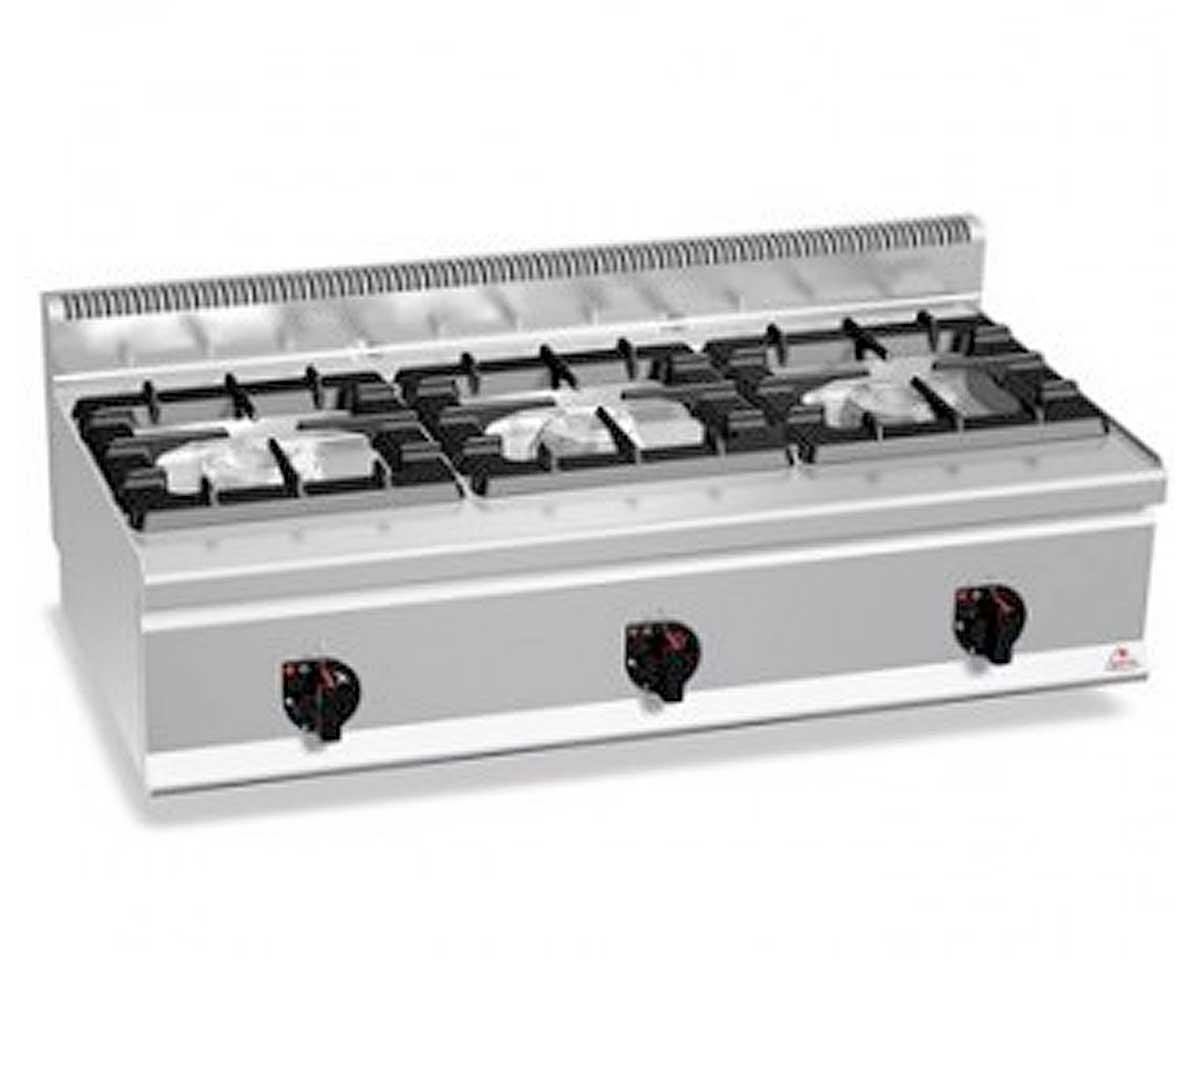 Cocina serie 600 sobremesa high de bertos - Fogones a gas ...